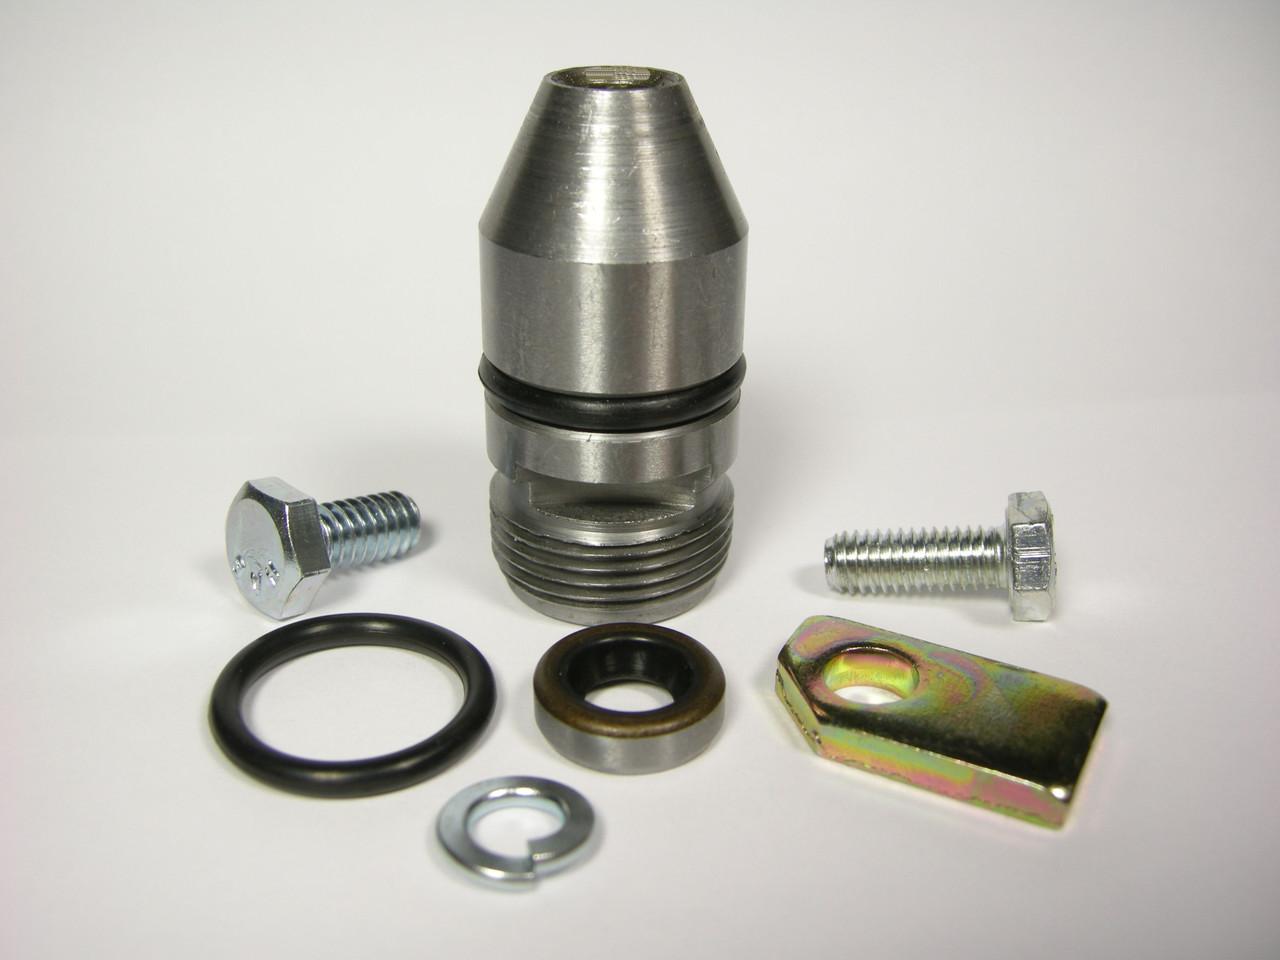 TH350 Speedo Housing Kit w/ Extra Seals & Retainer Bracket Speedometer Turbo 350